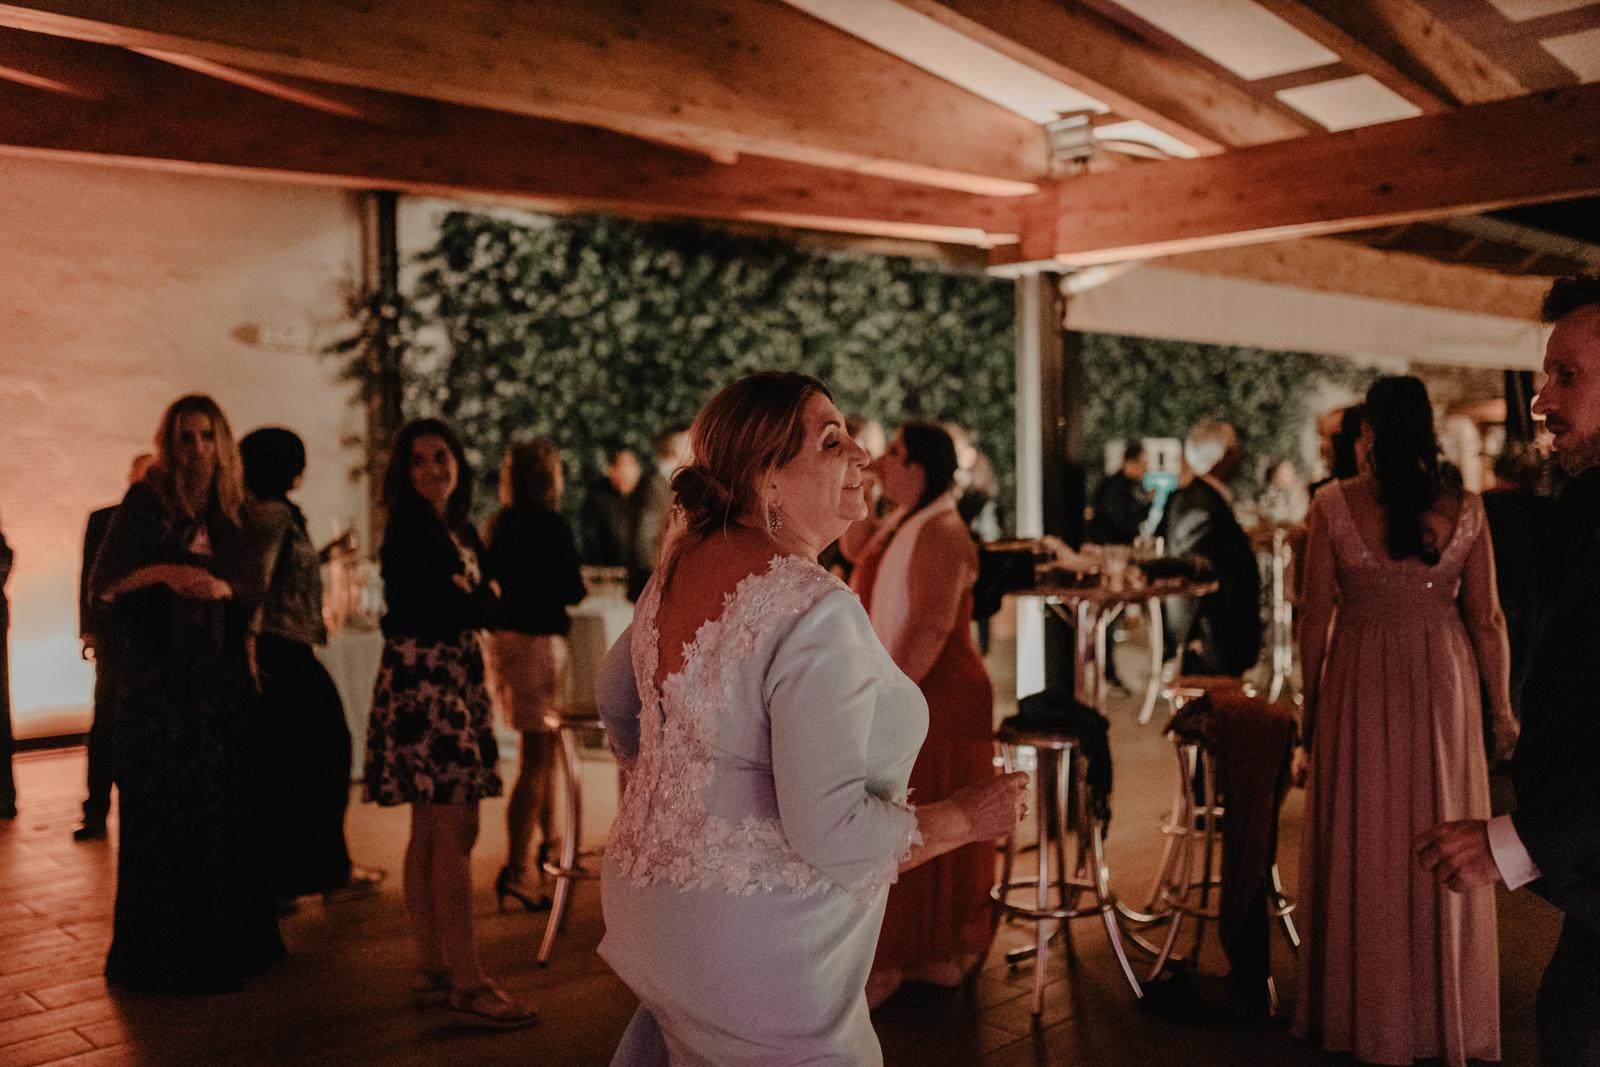 thenortherngirlphotography_photography_thenortherngirl_rebeccascabros_wedding_weddingphotography_weddingphotographer_barcelona_bodaenbarcelona_bodaenmaselmarti_bodarogeryvane-1050.jpg